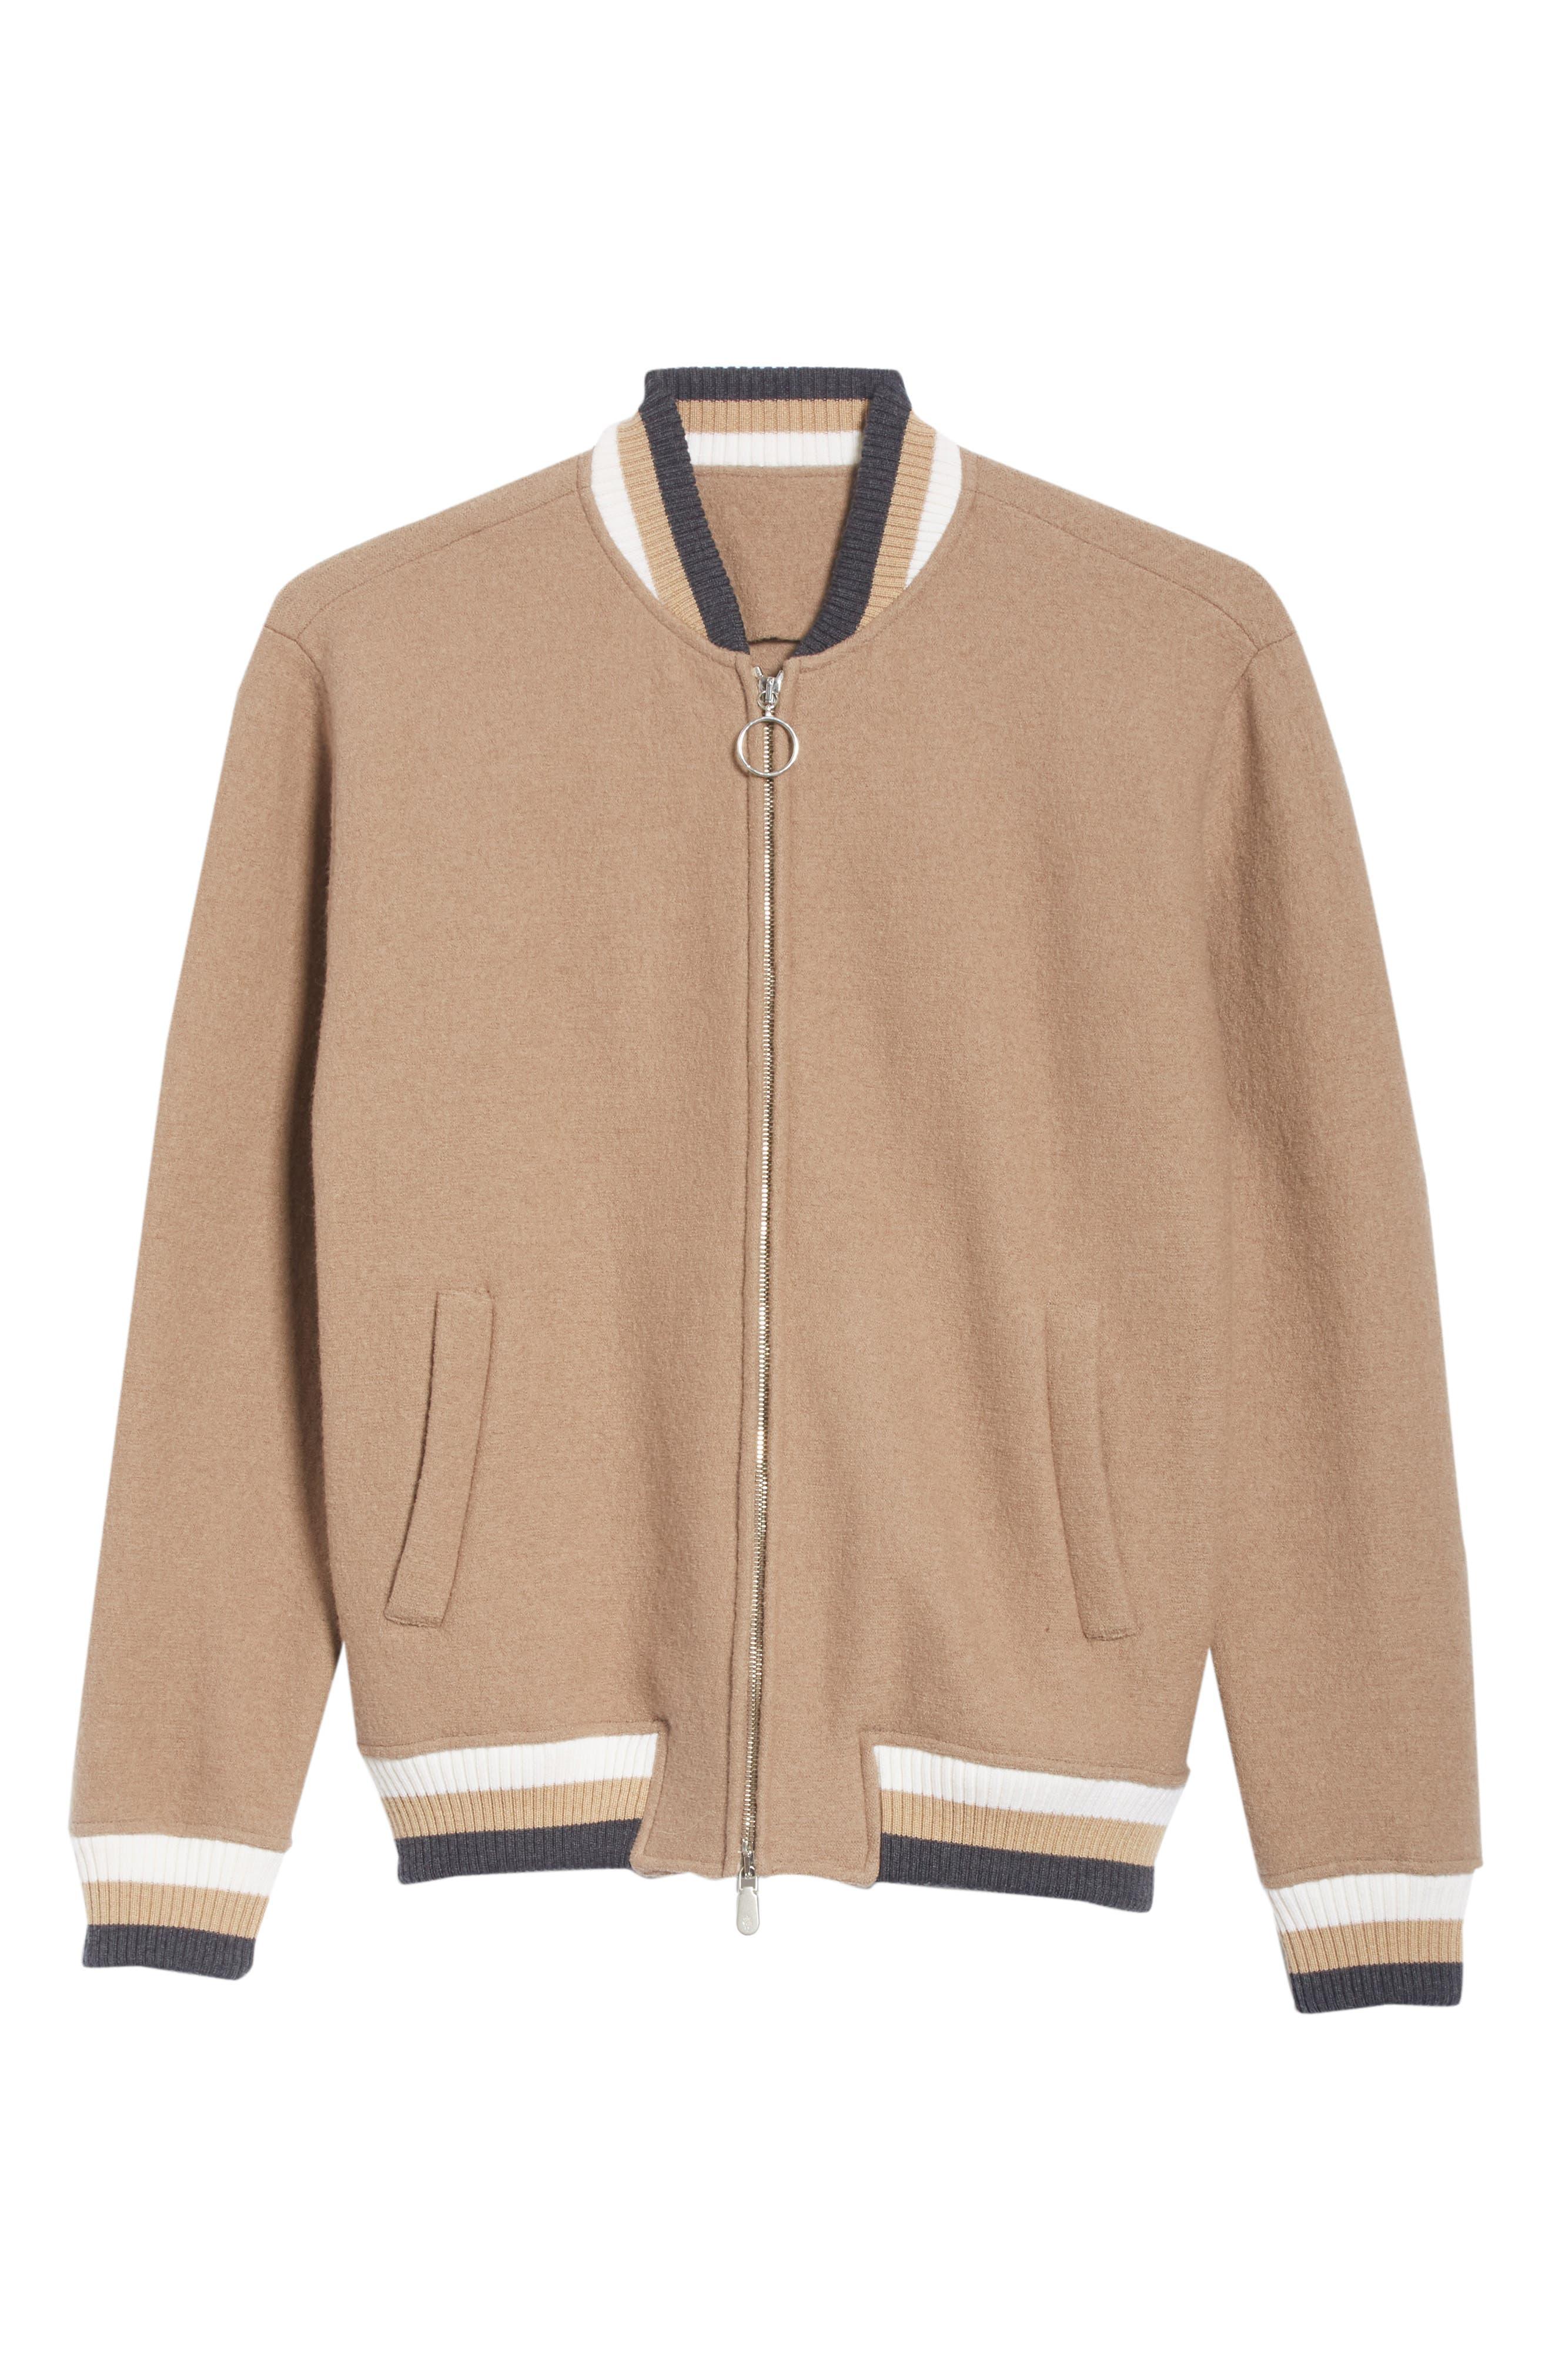 Wool Bomber Jacket,                             Alternate thumbnail 5, color,                             CAMEL